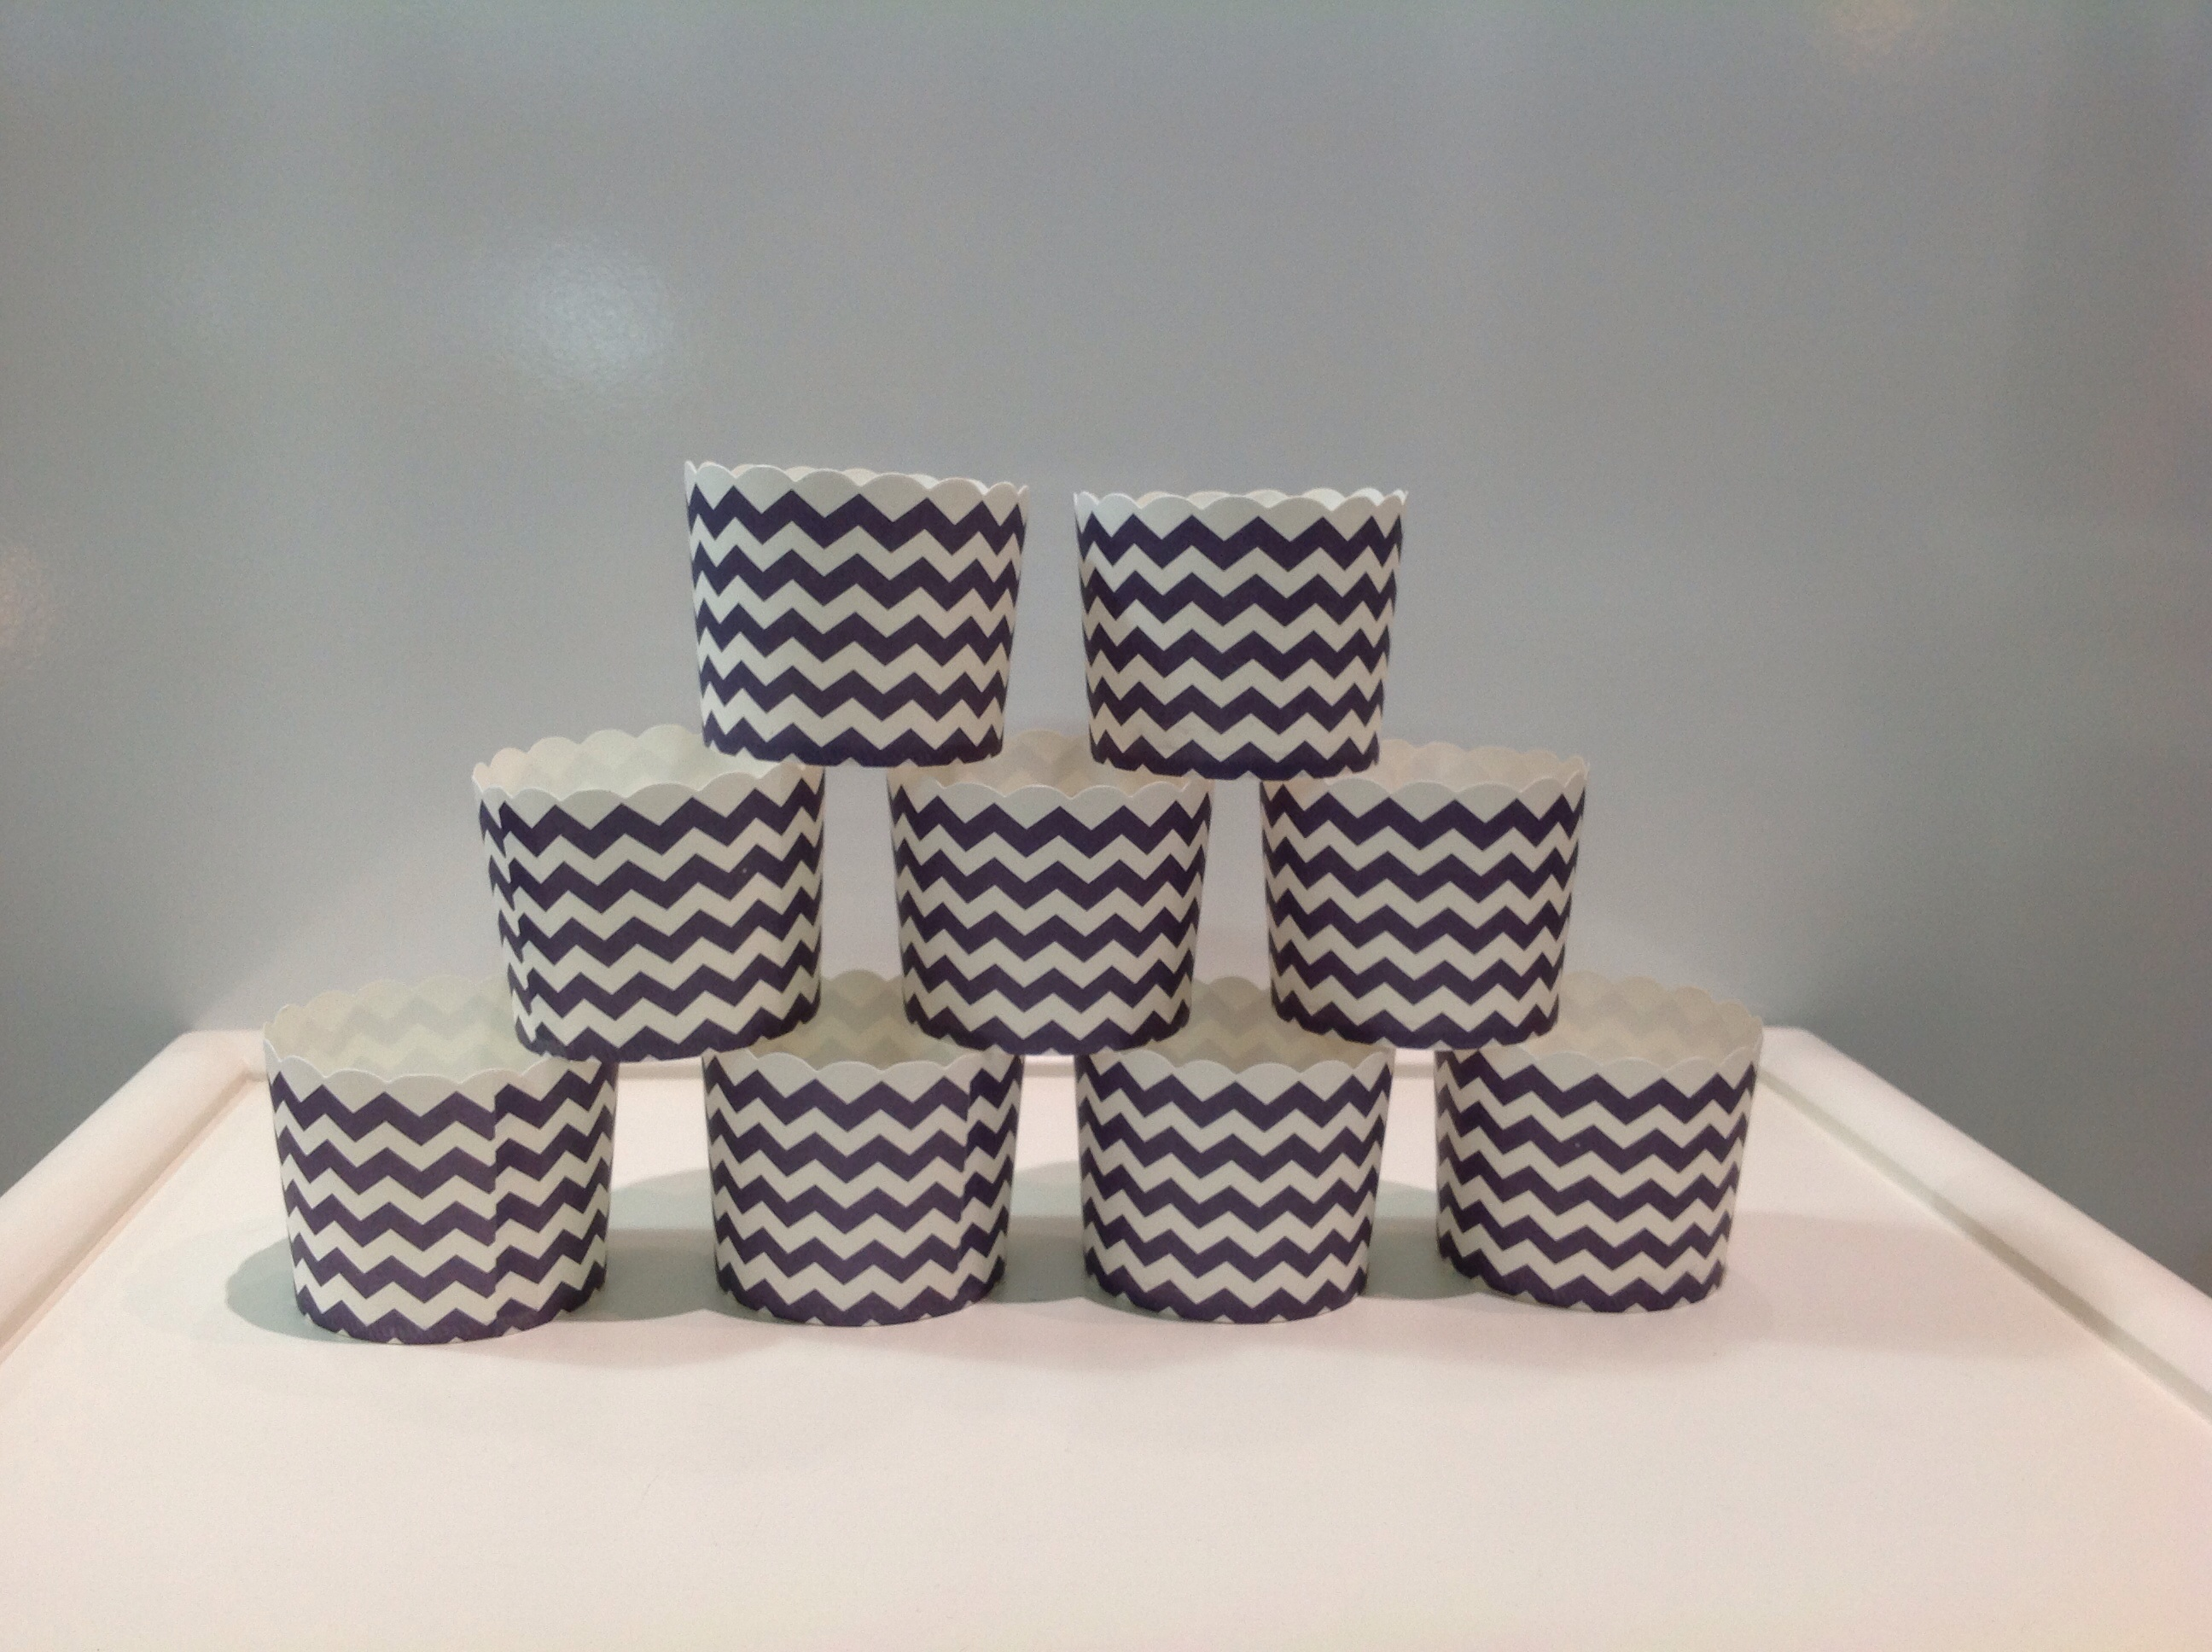 Medium size baking cup JM74